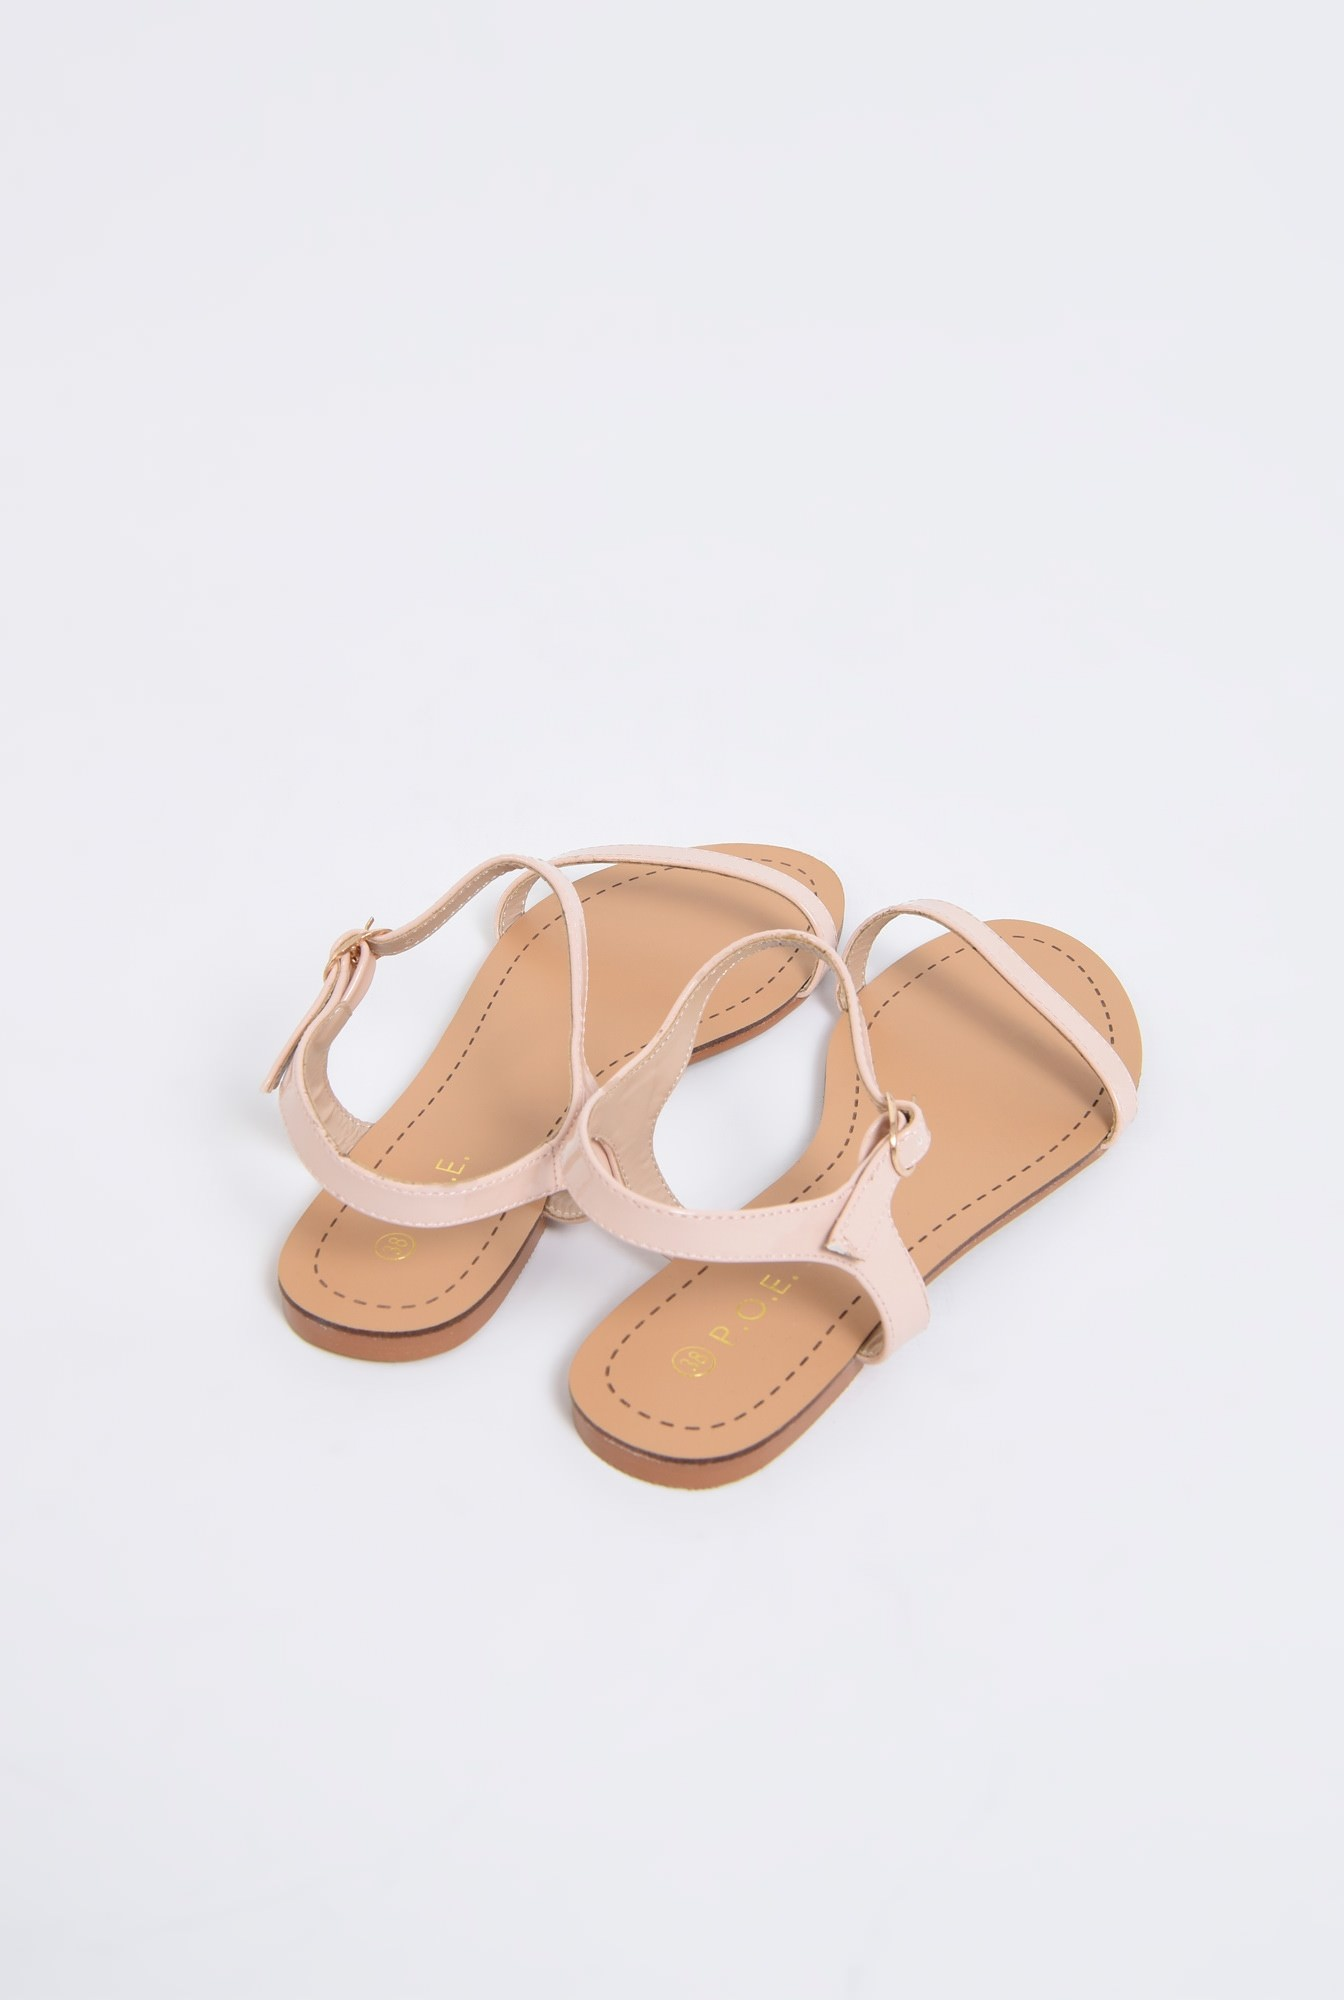 3 - sandale din lac, crem, minimaliste, talpa joasa